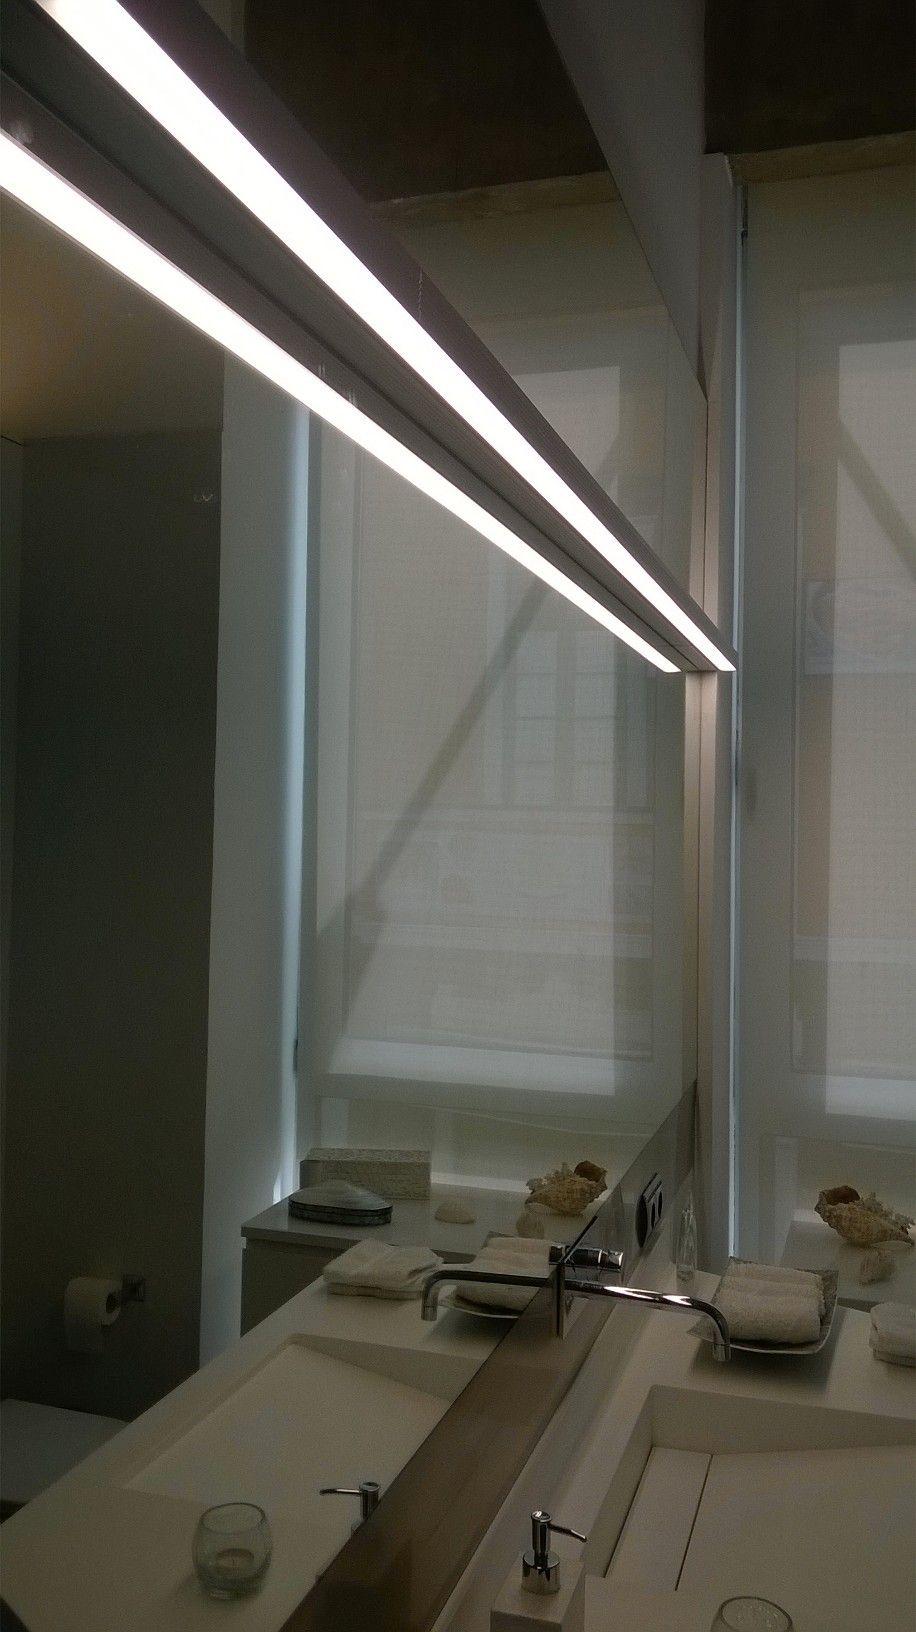 Doble iluminaci n de ba o con tiras led leduxe en perfil for Iluminacion bano led